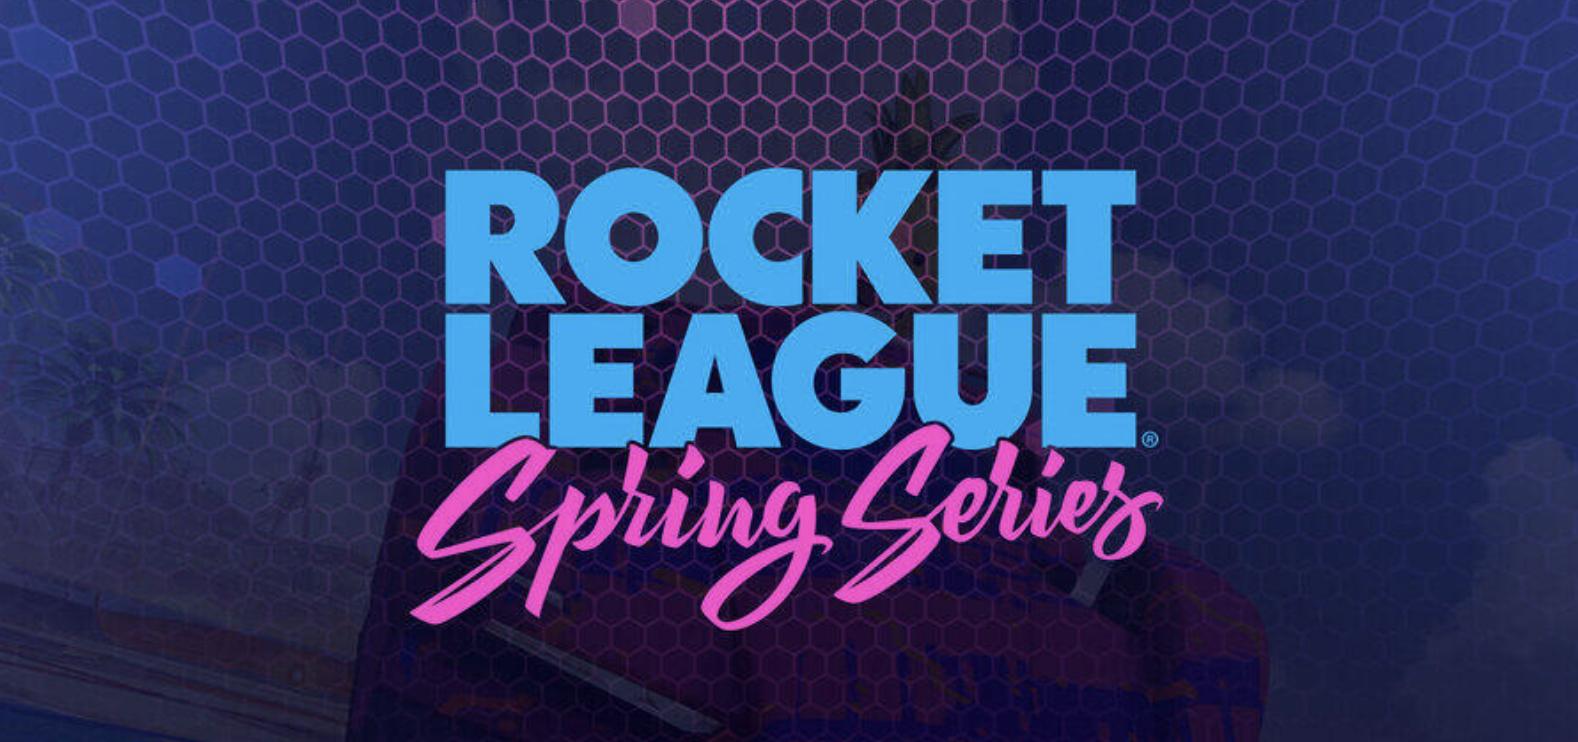 rocket-league-europe